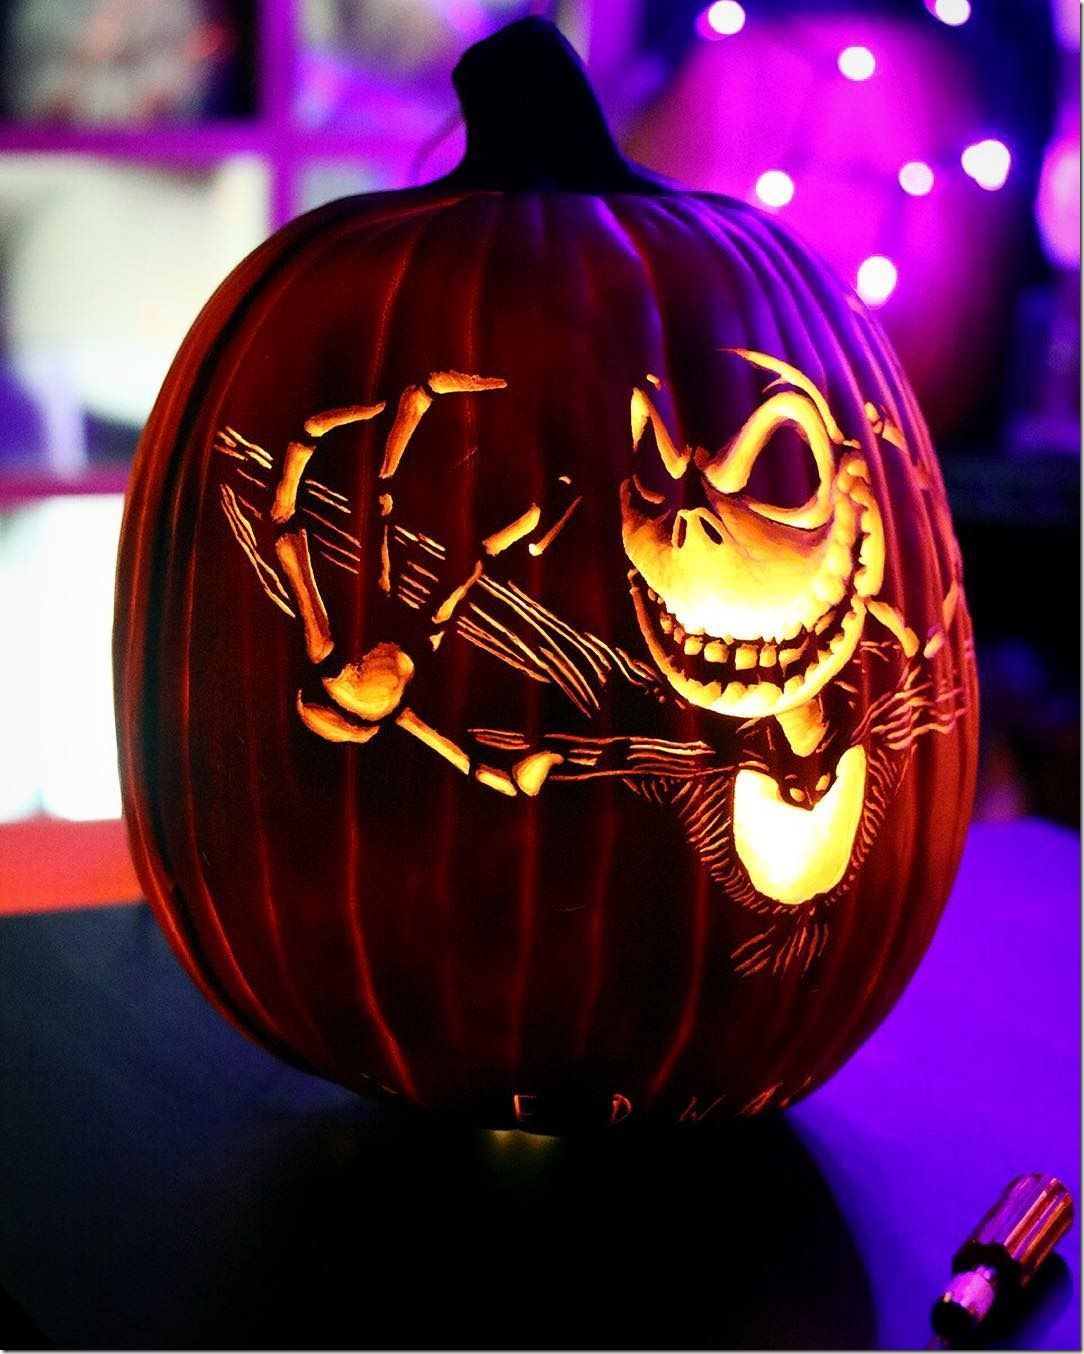 This Wonderful Jack Skellington Pumpkin Carving Will Reach